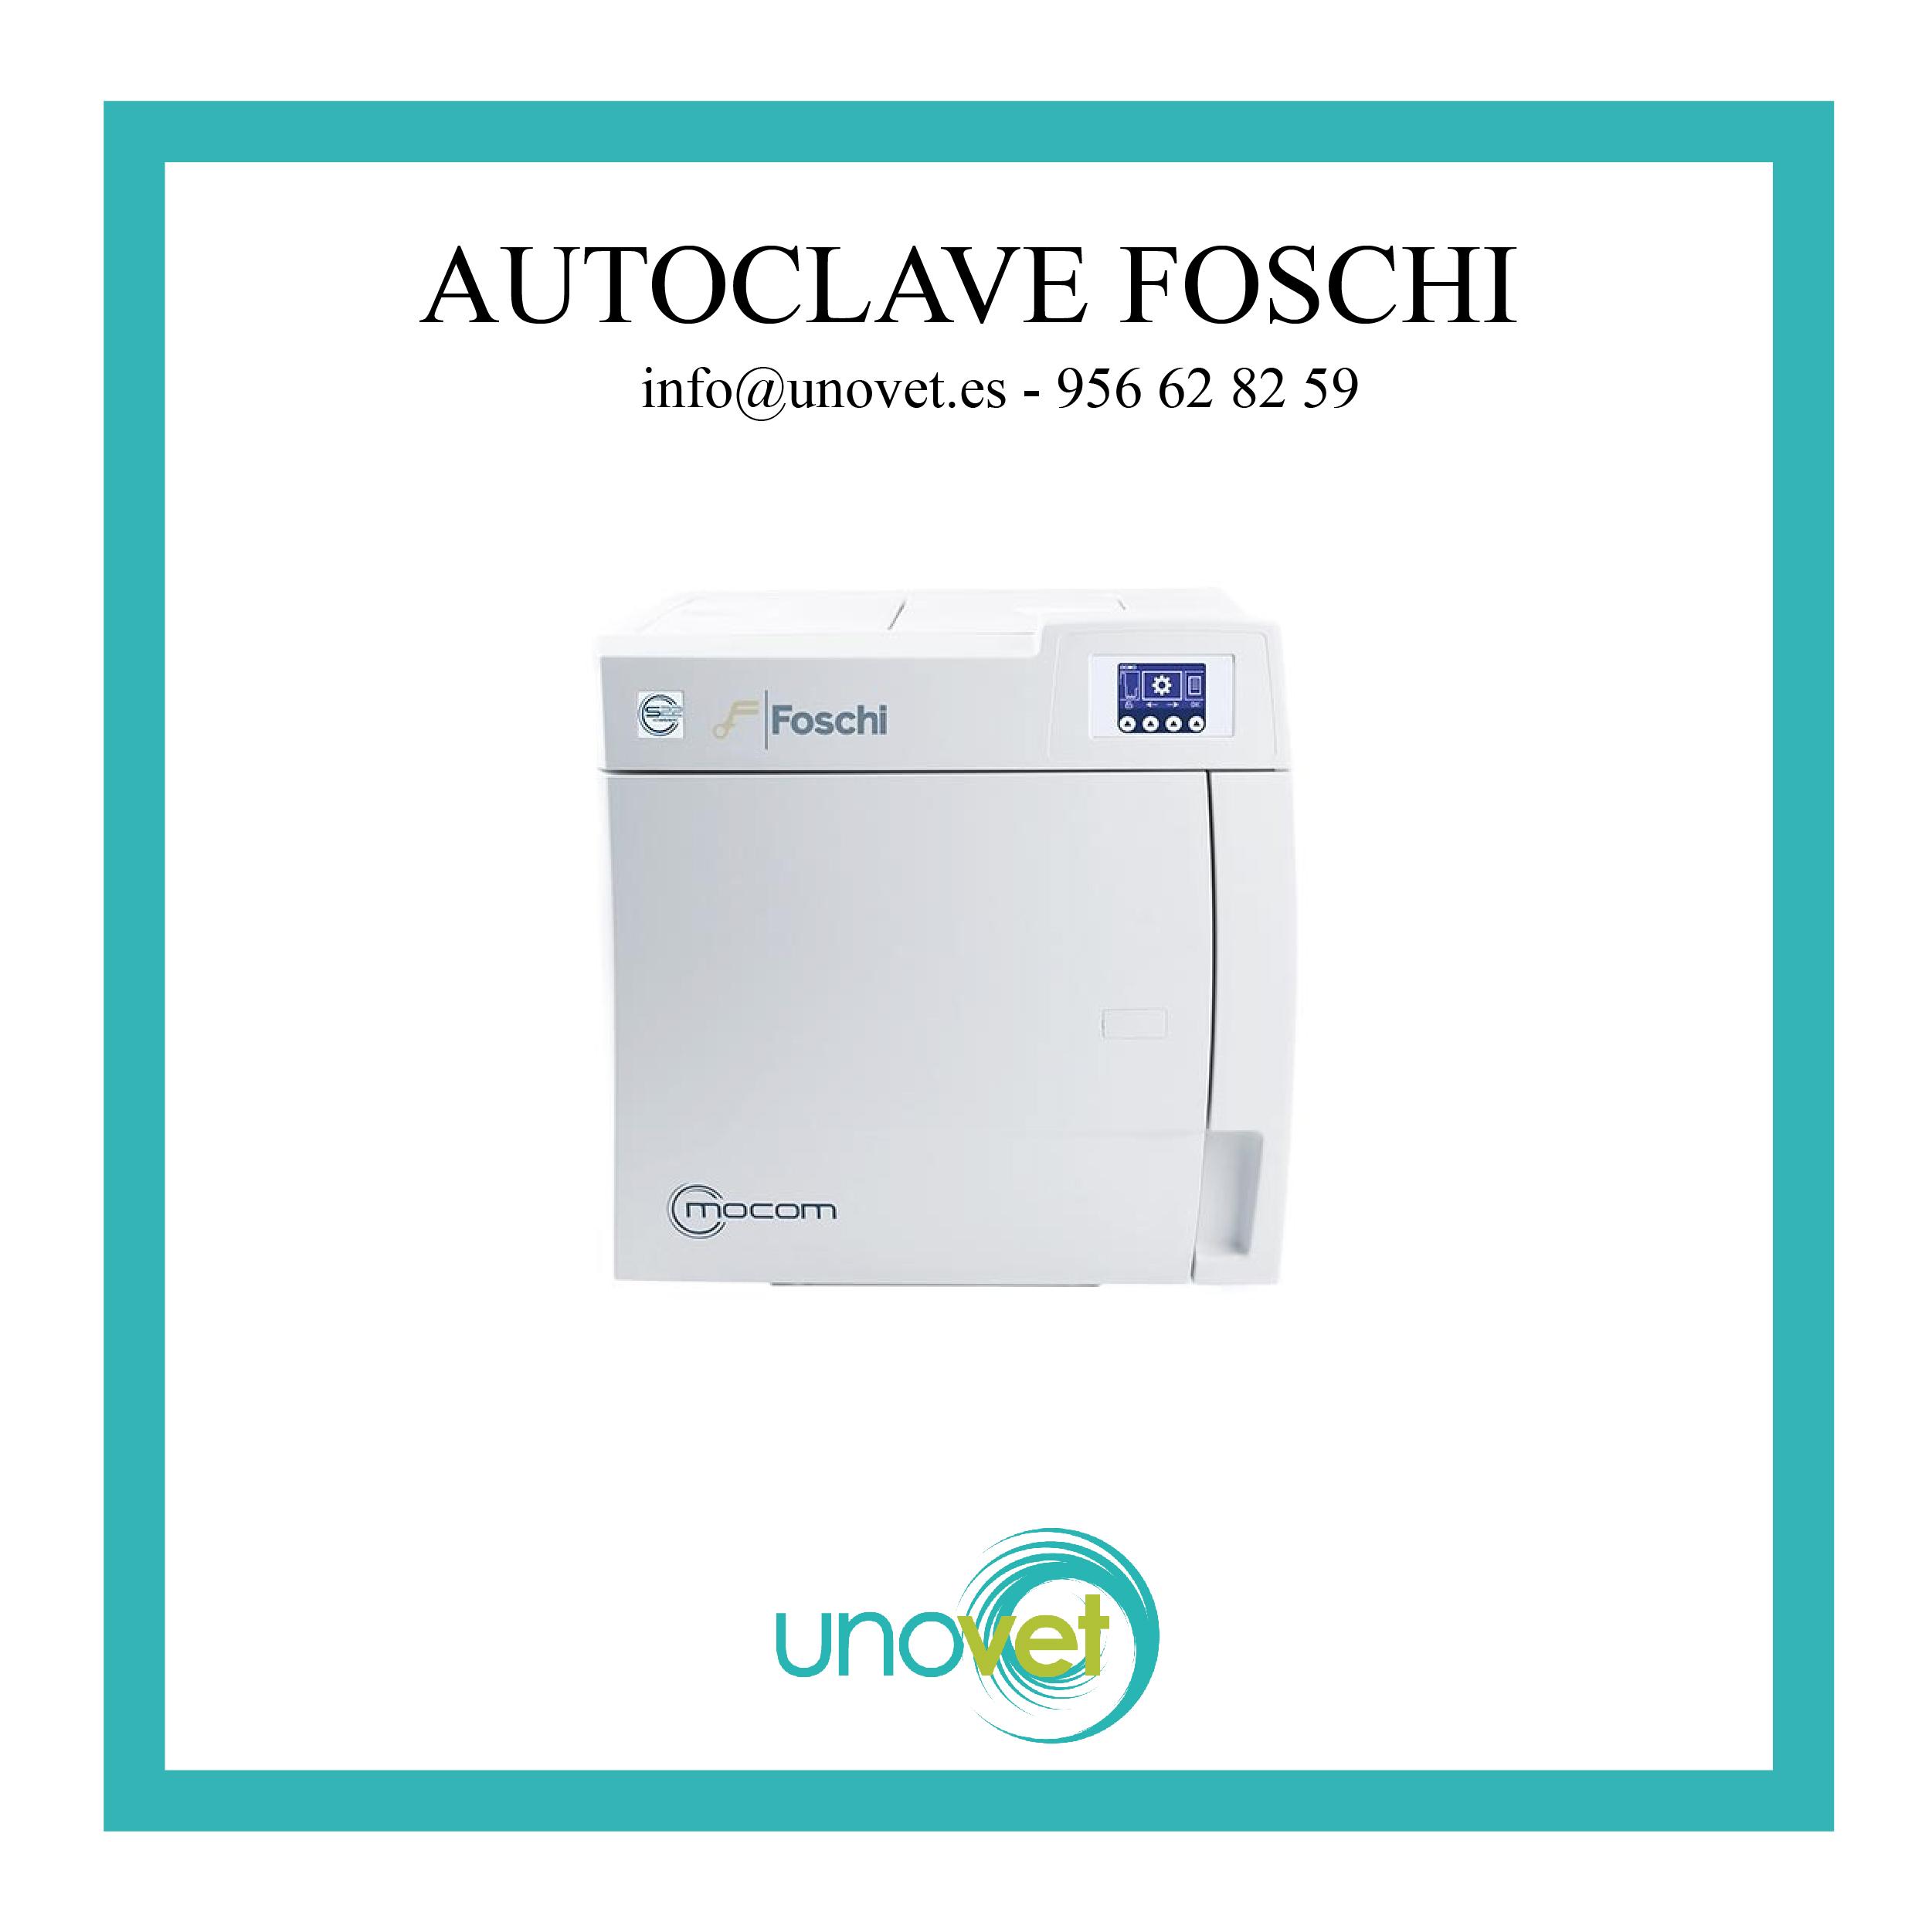 Catálogo autoclave